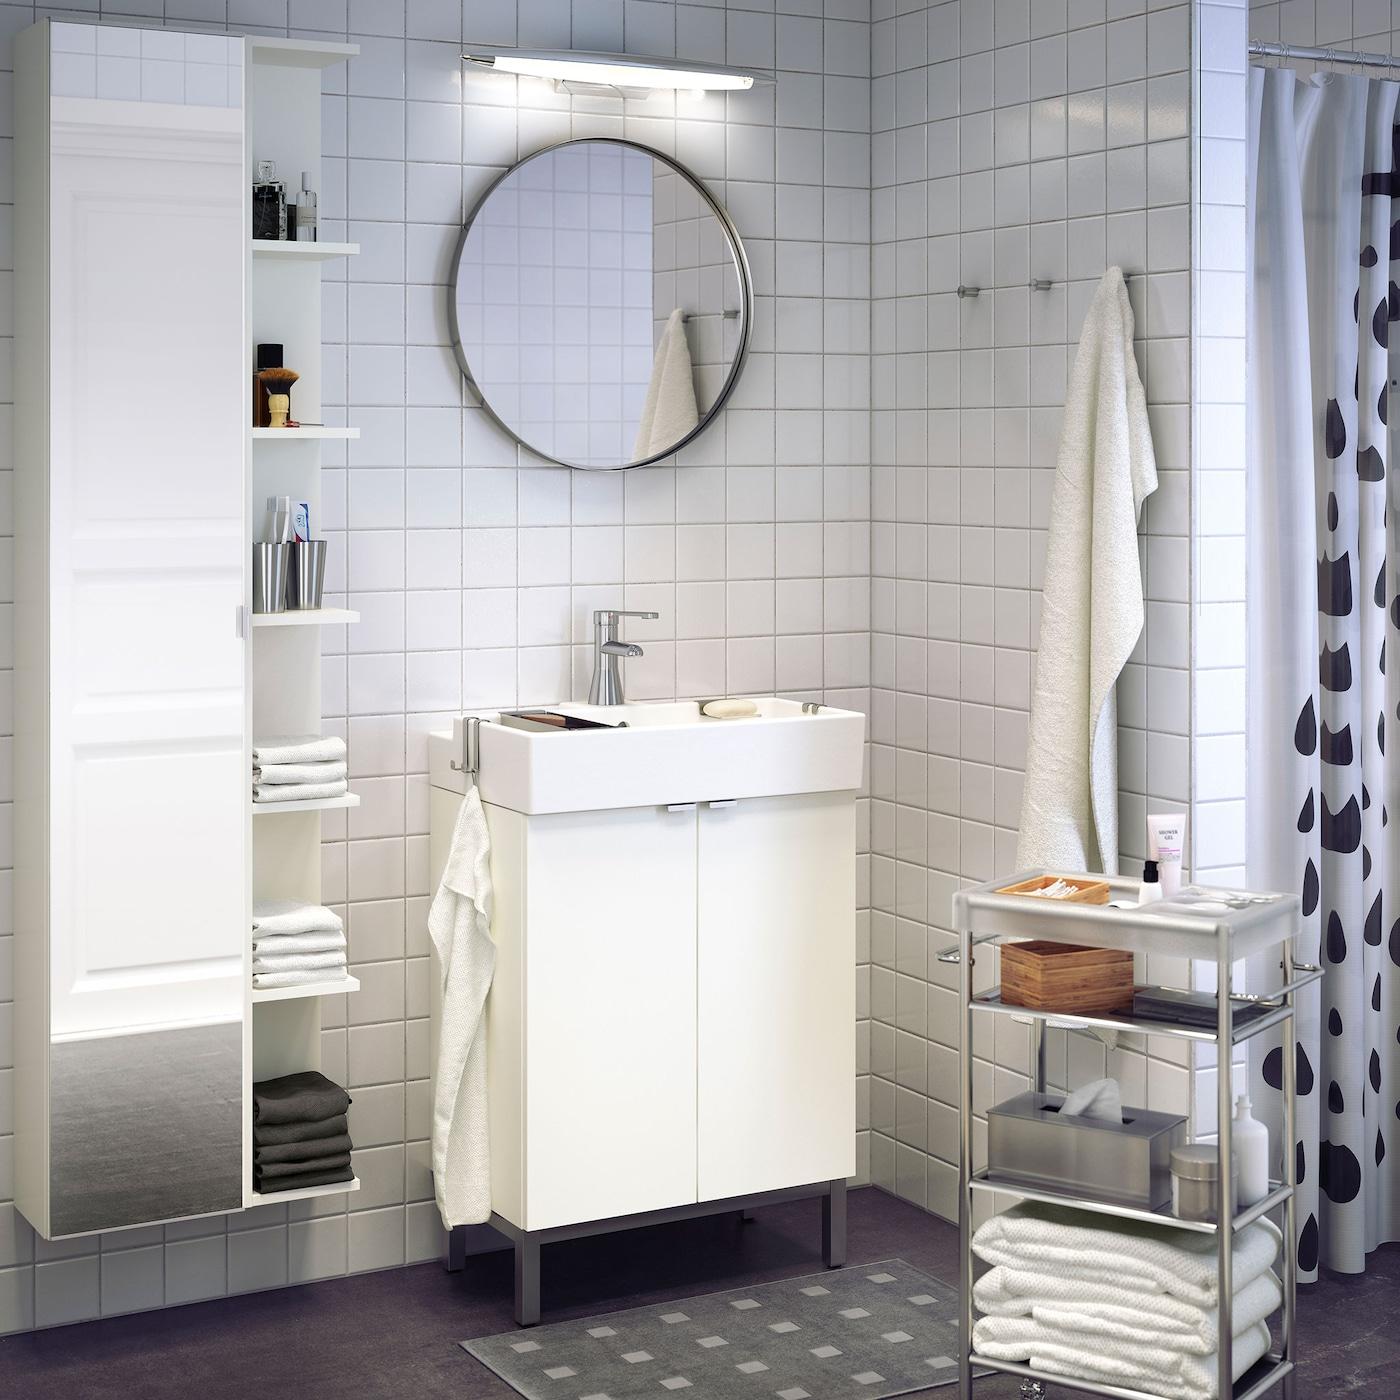 Charmant Salle De Bain : Serie LILLANGEN IKEA